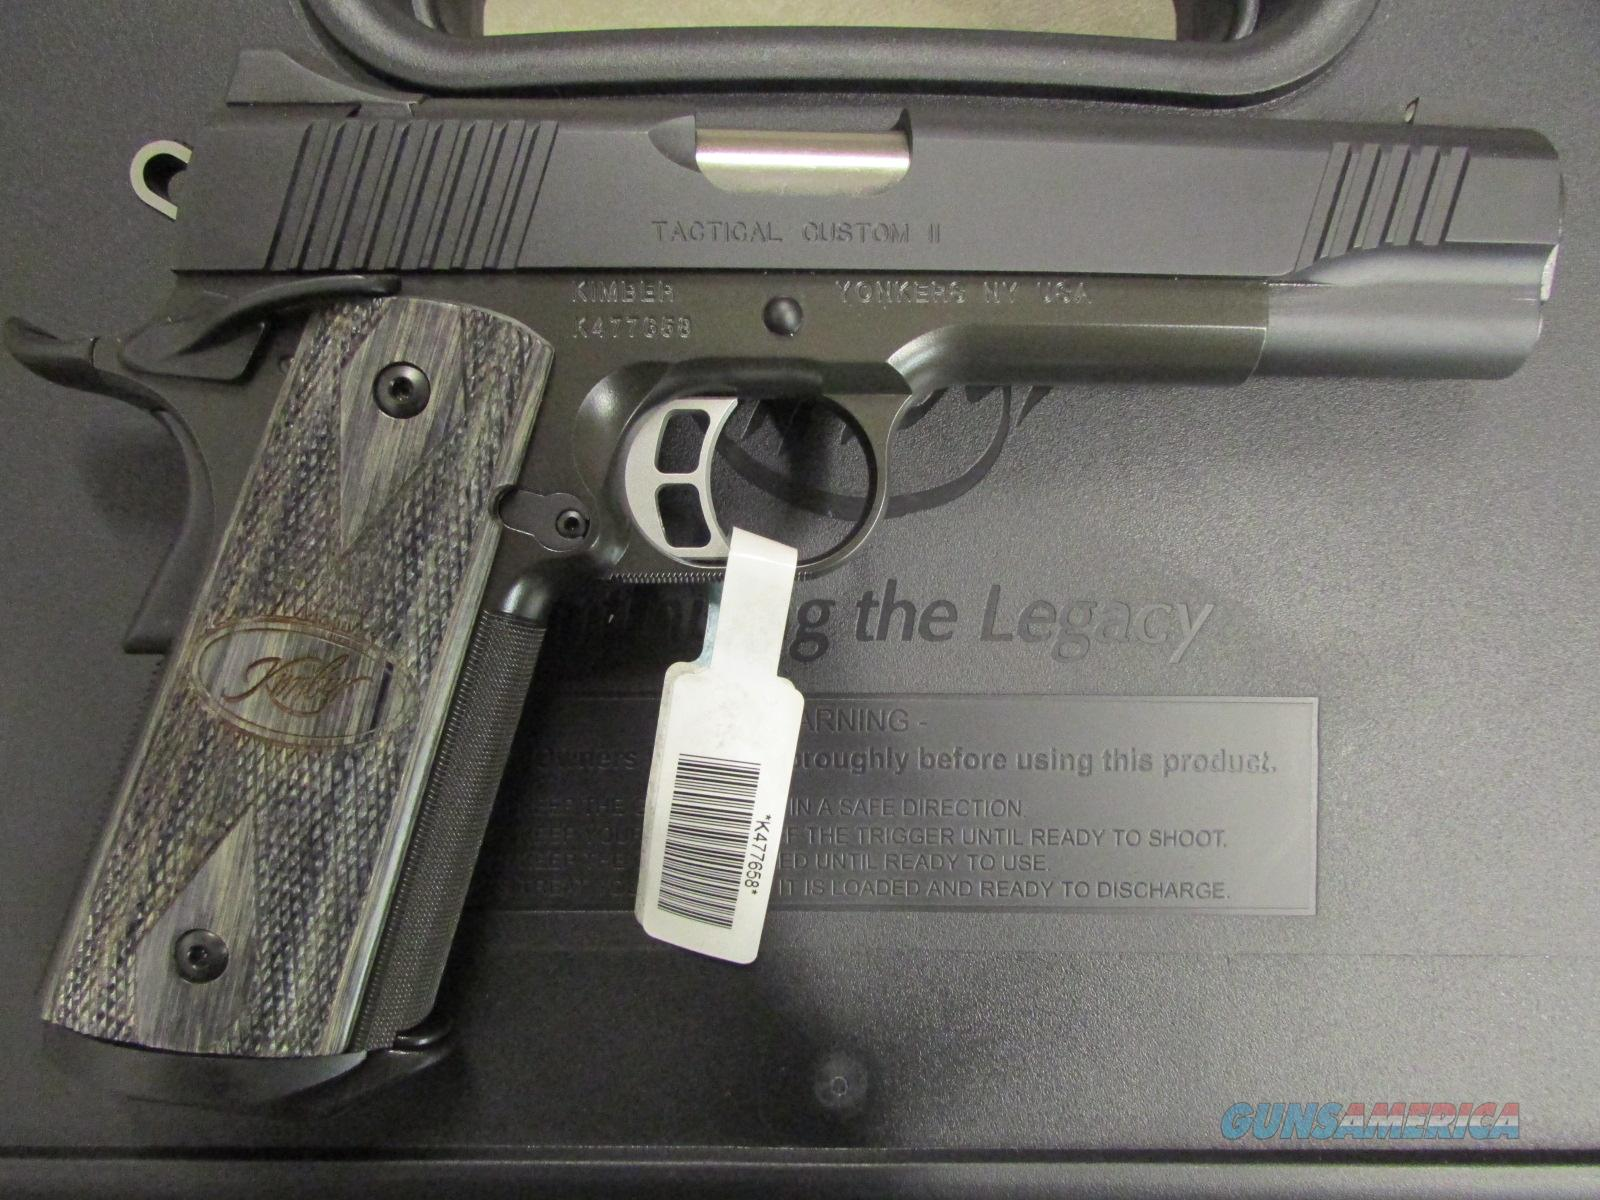 100+ Custom 1911 Tactical Pistols – yasminroohi